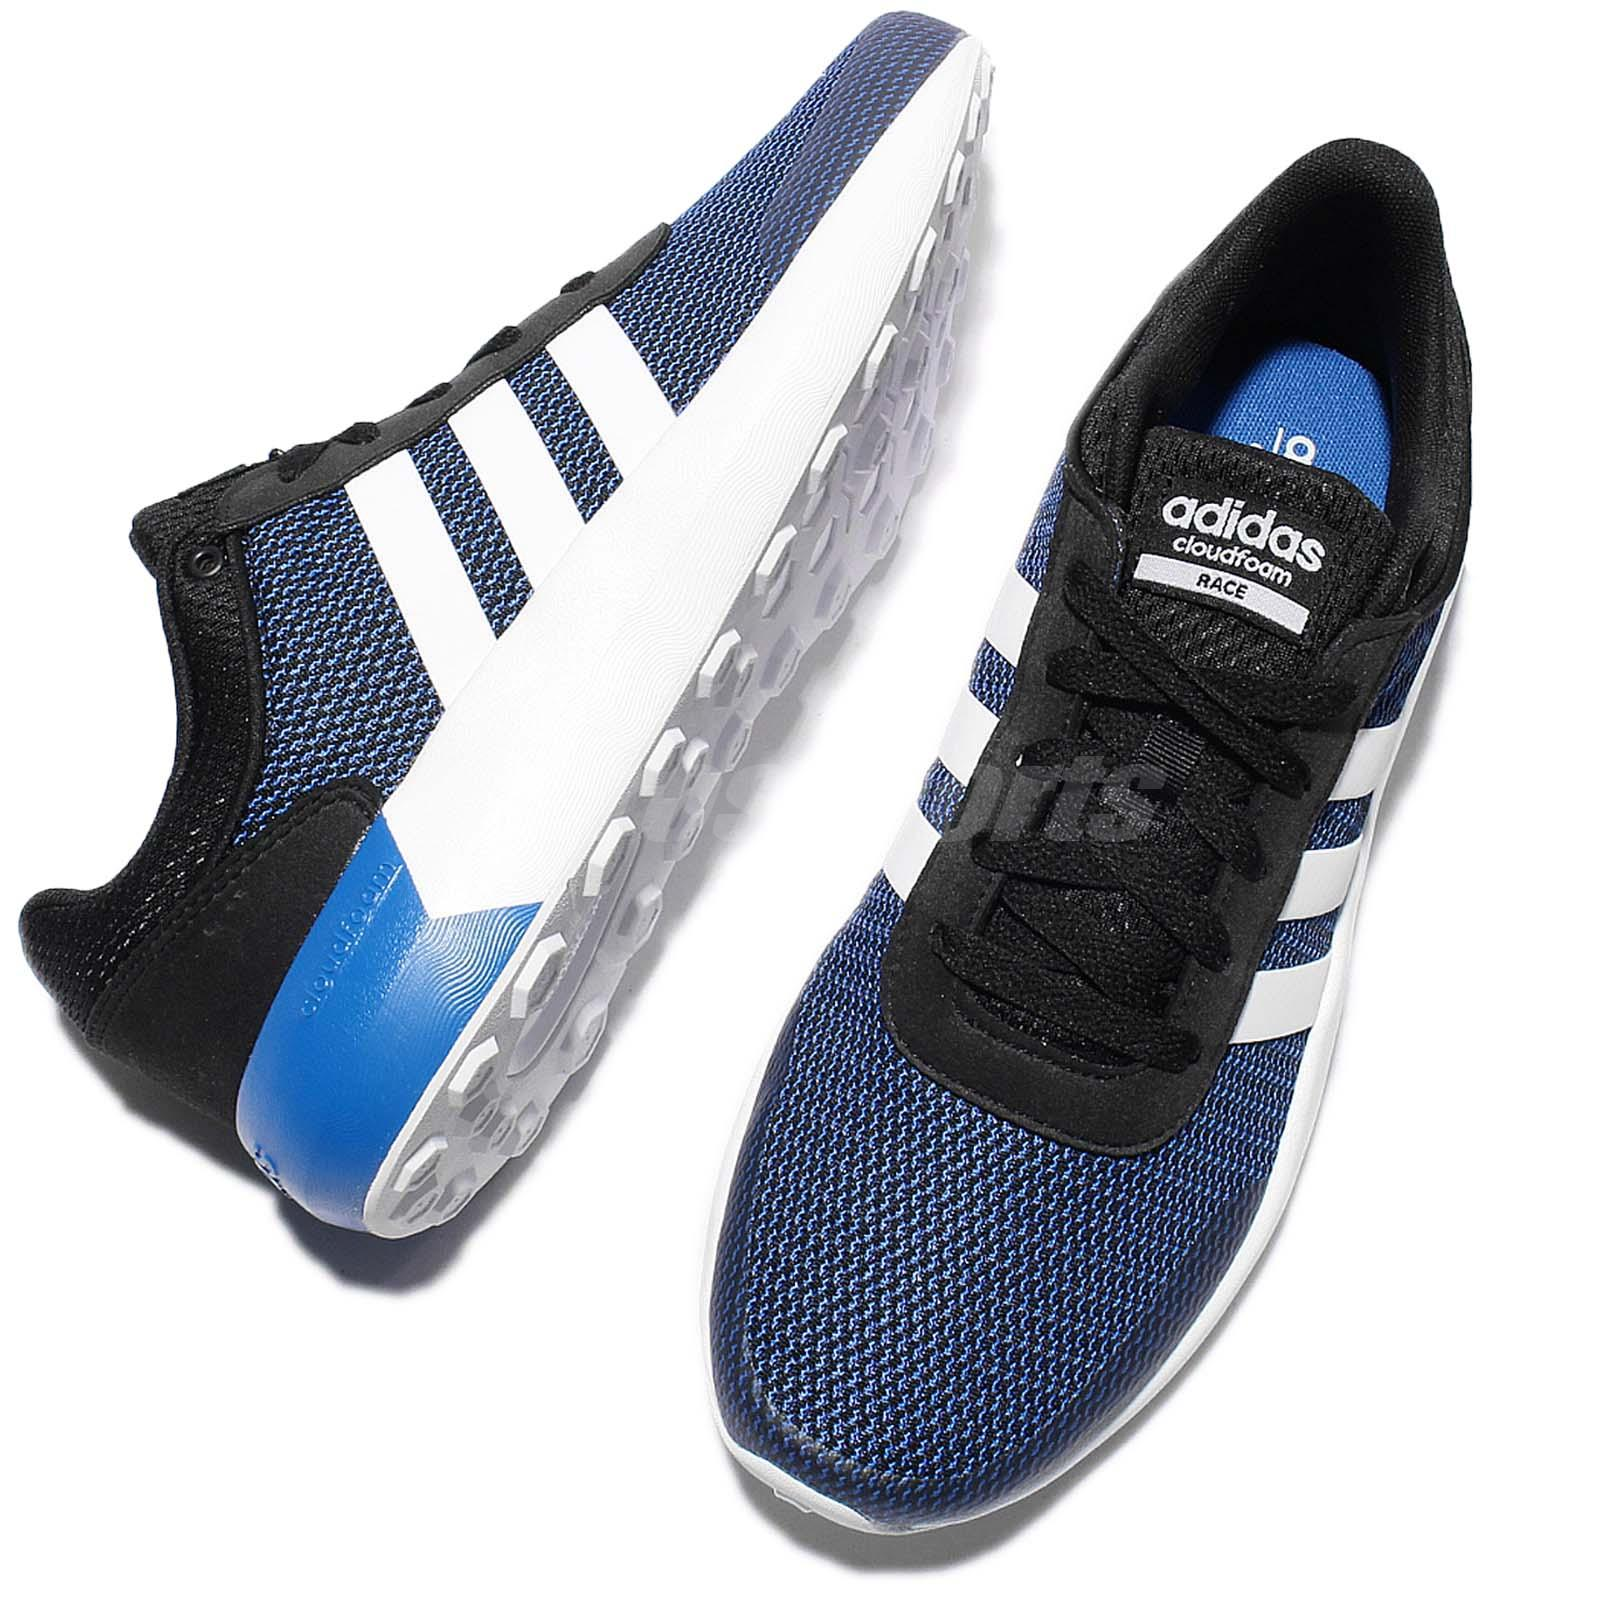 Adidas evoluzione le scarpe é fi j'arr ê te, j'y gagne '!